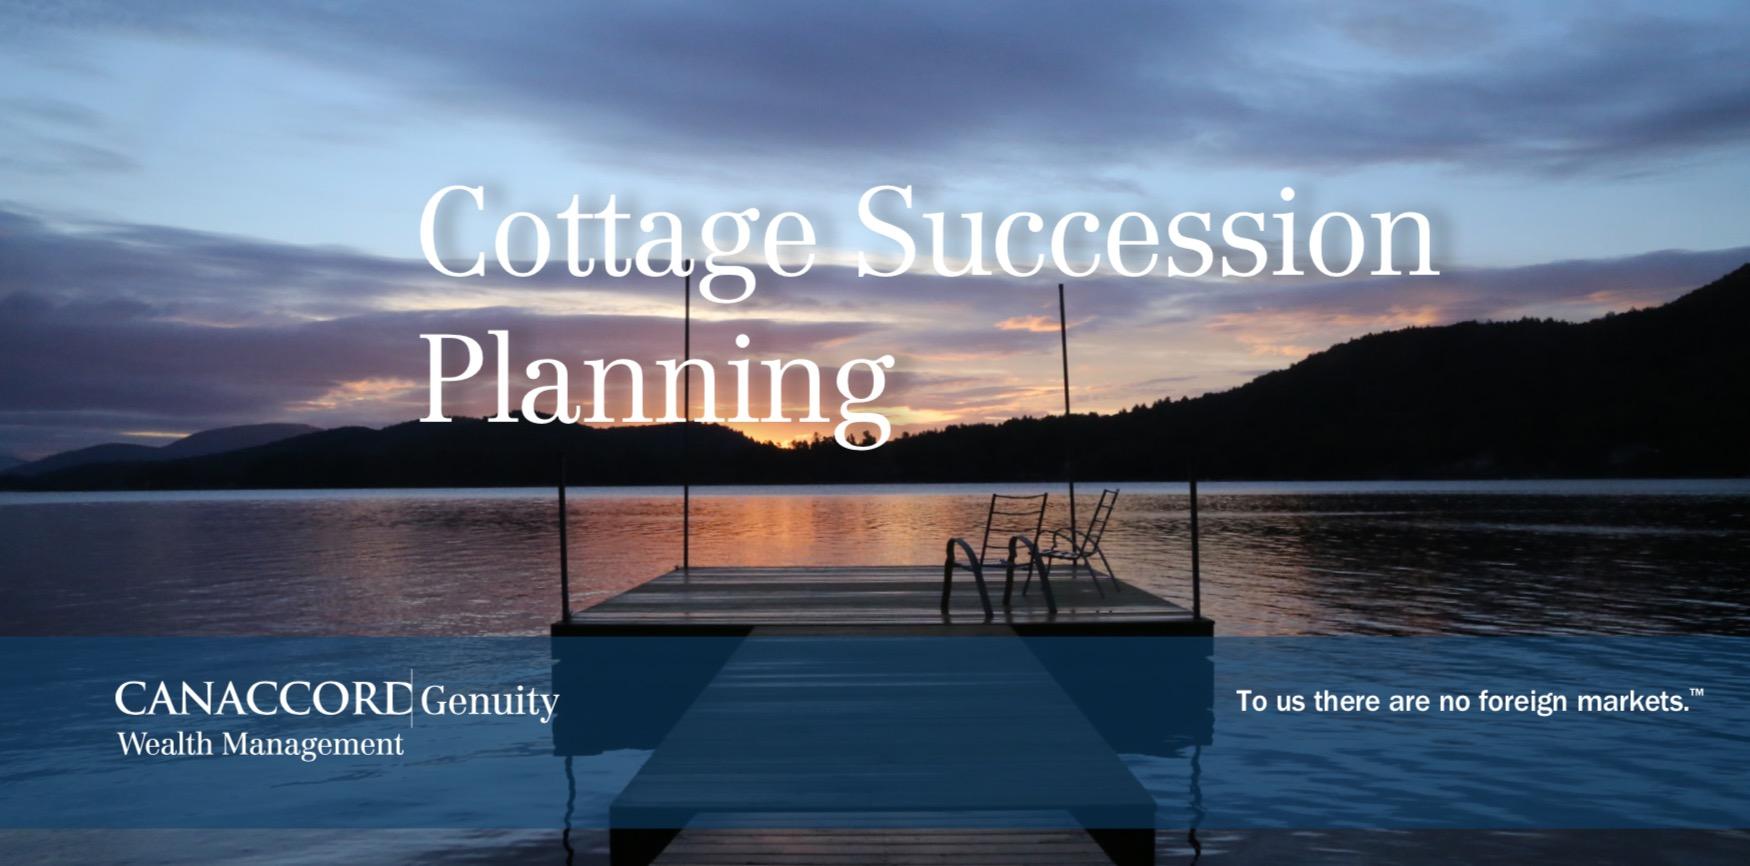 Cottage Succession Planning